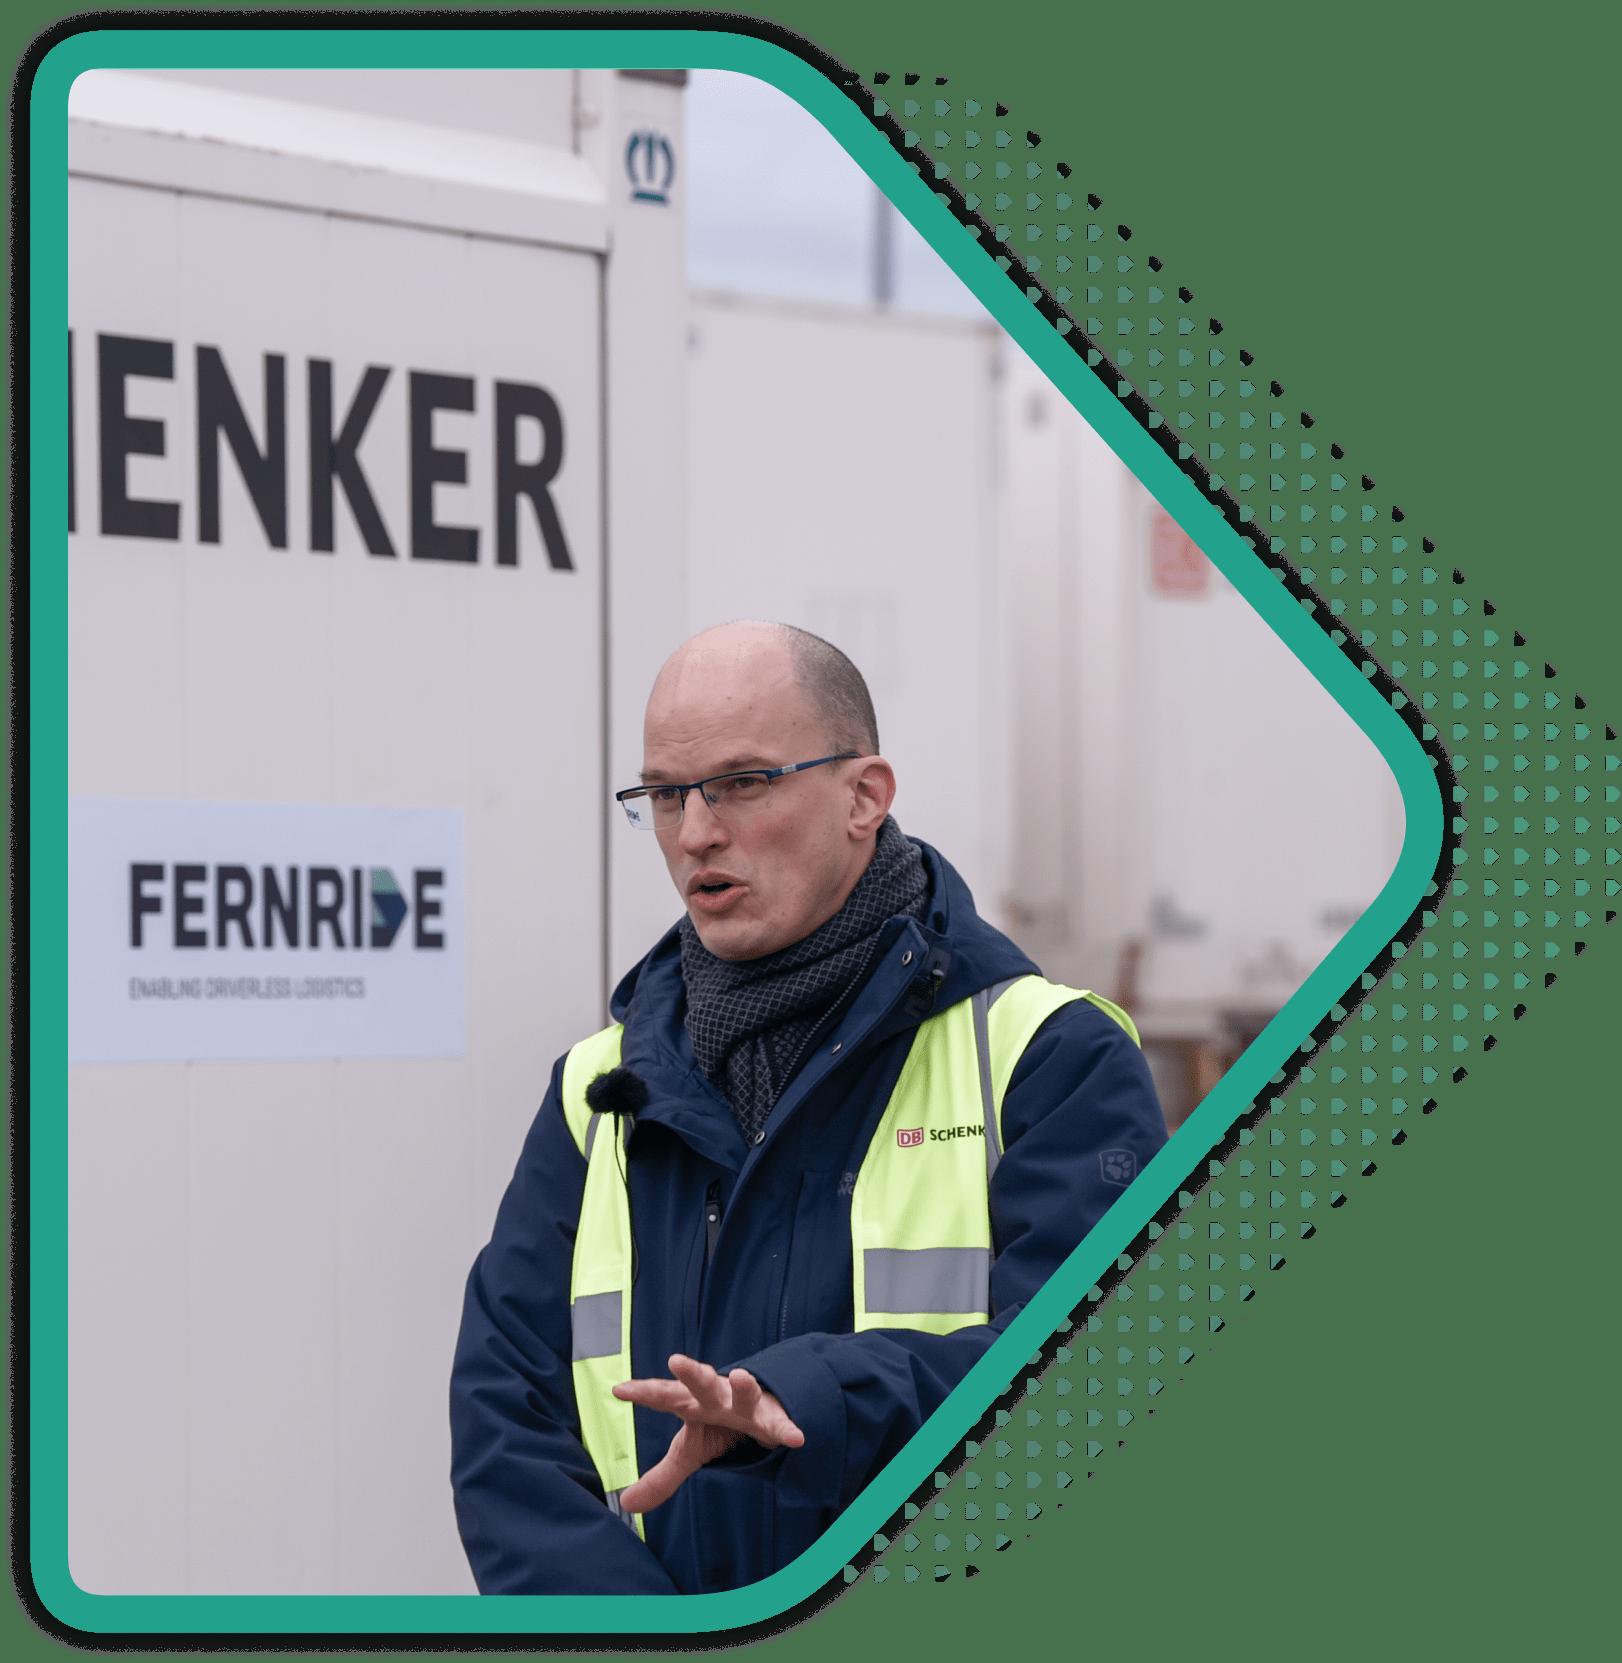 Image of Christoph Herchenhein from DB Schenker